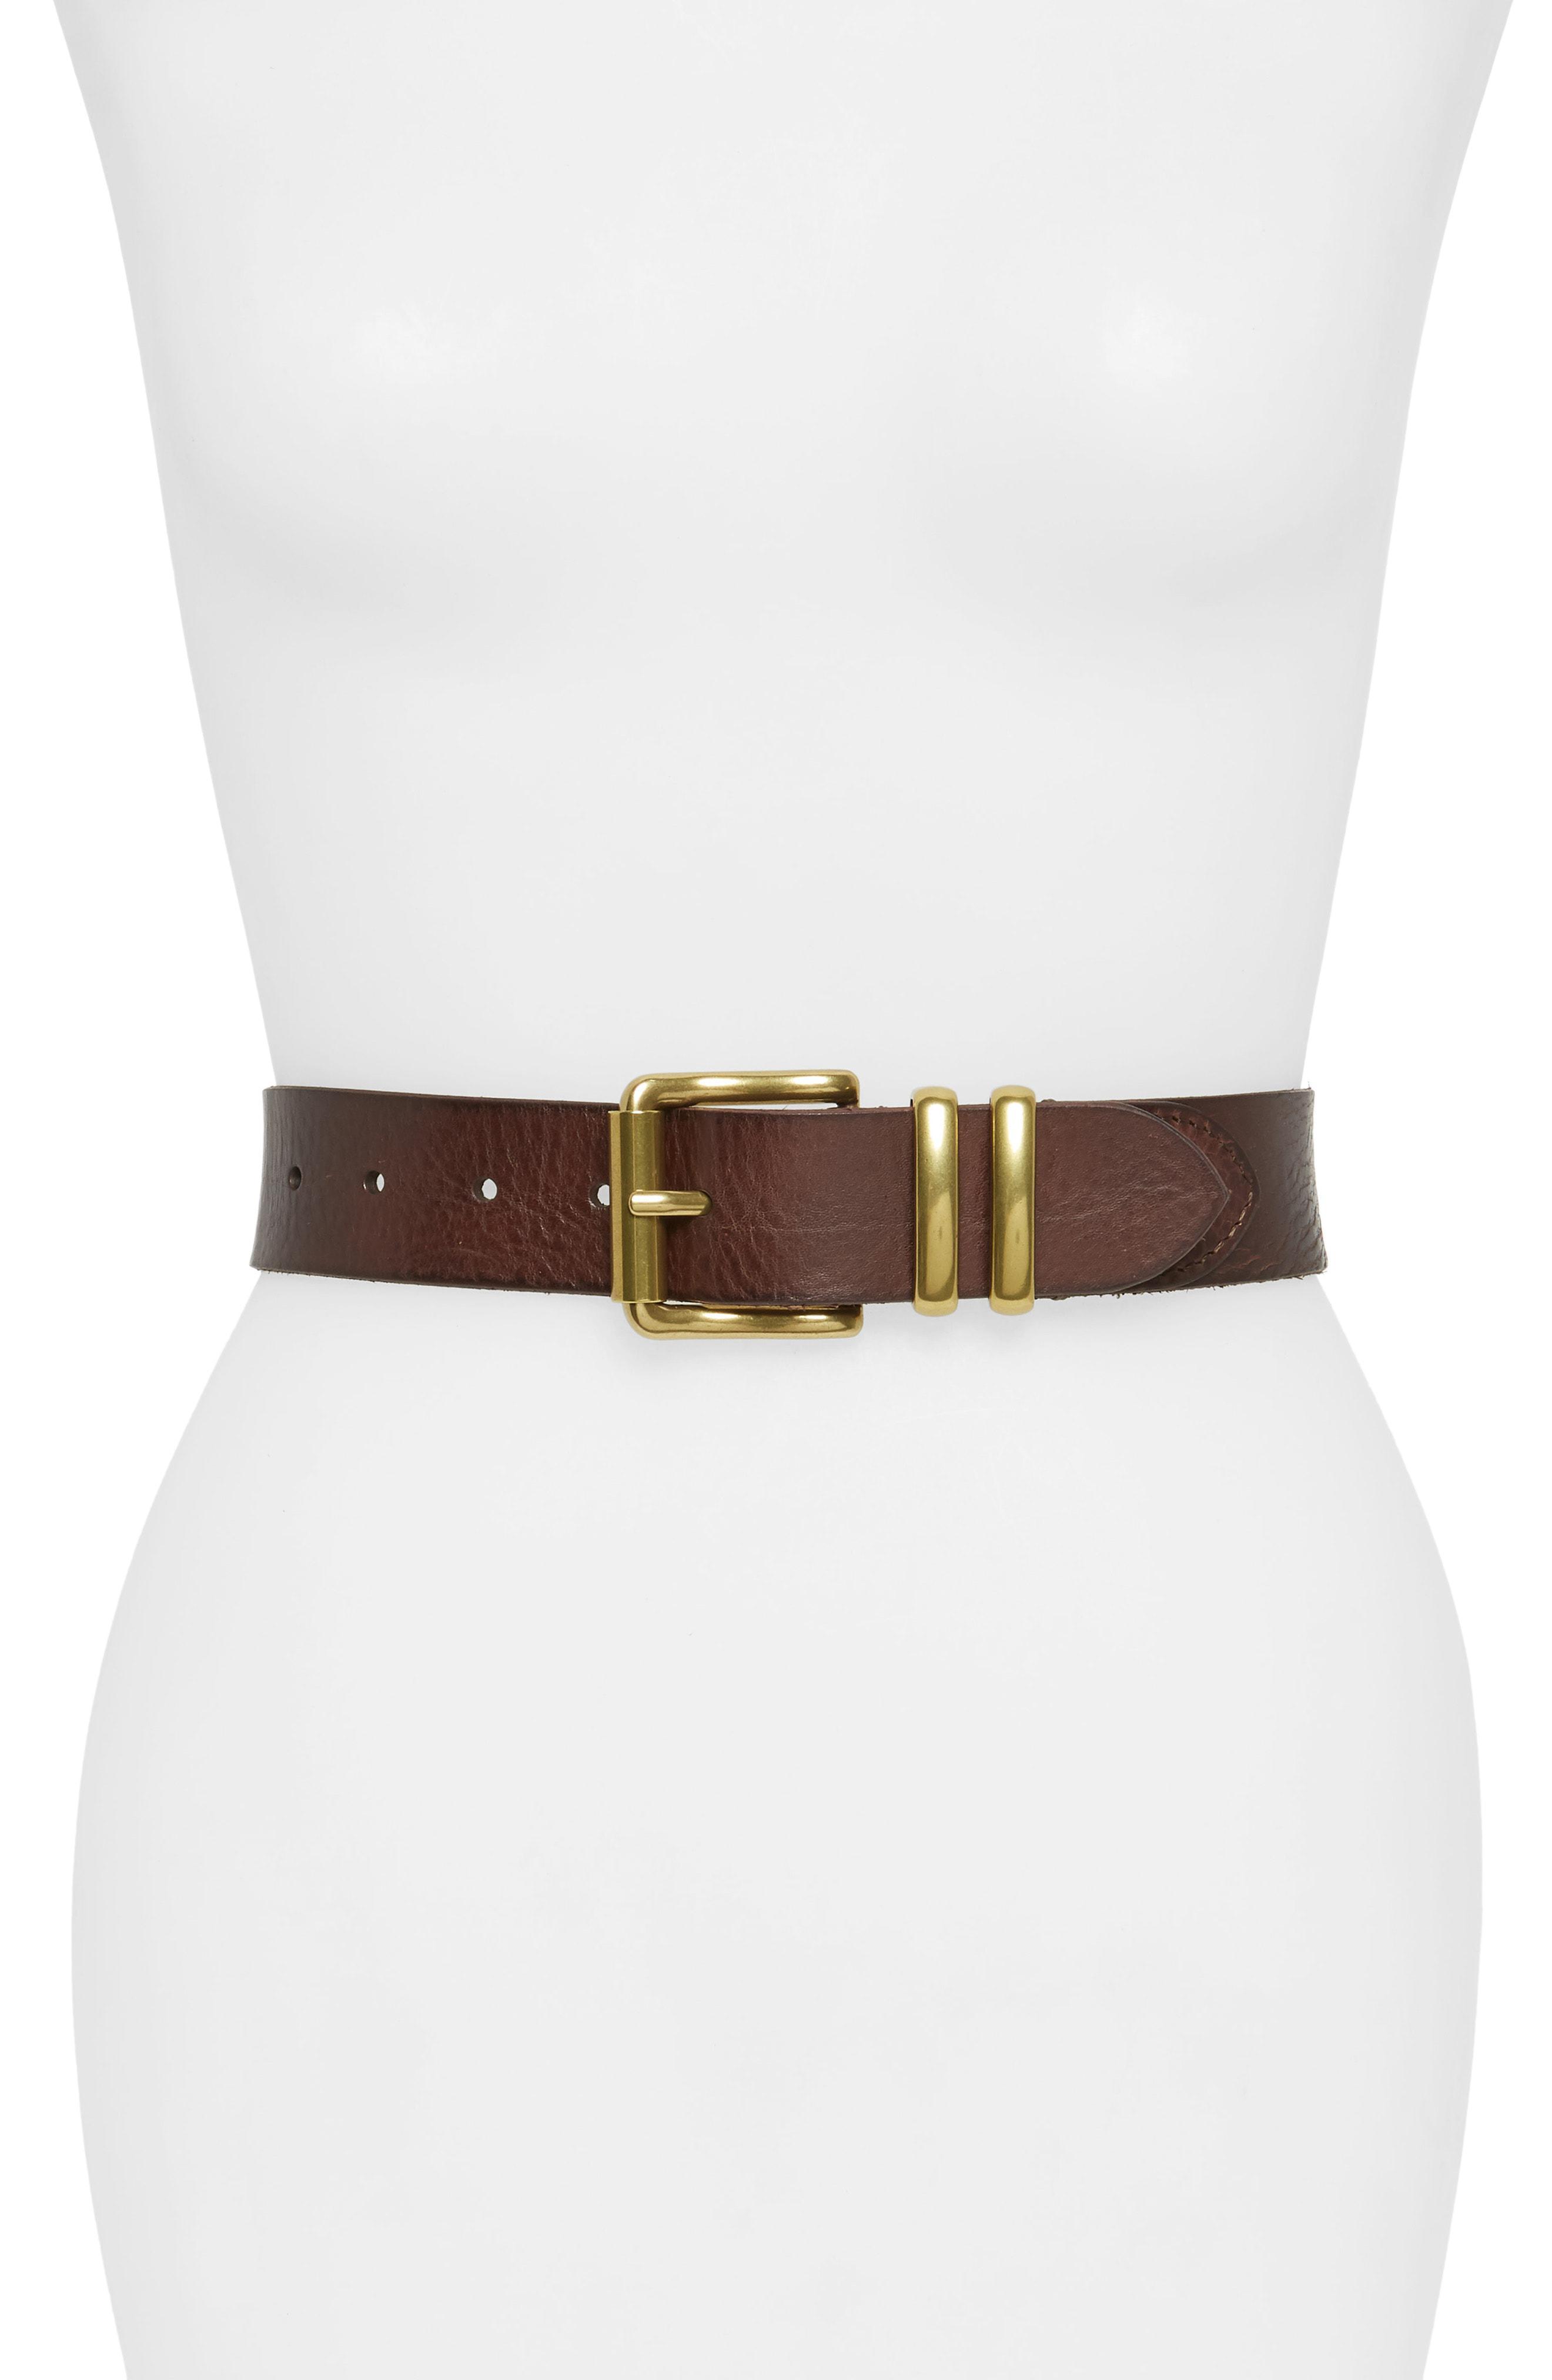 MONIQUE Men Western Horseshoe Buckle Braided Leather Dress 30mm Wide Belt